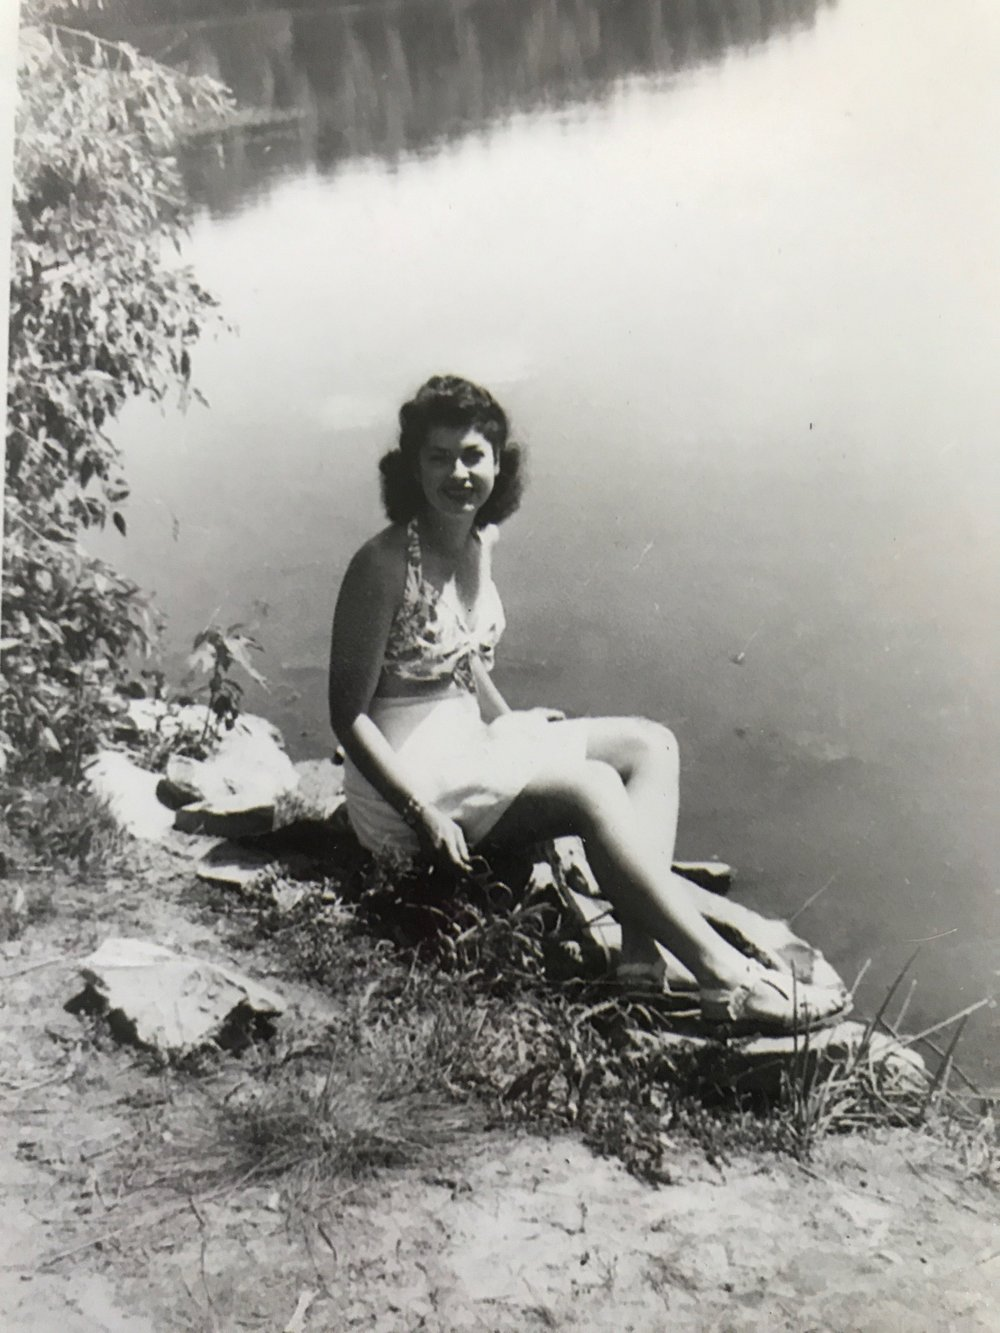 My paternal grandmother, LaVerne.